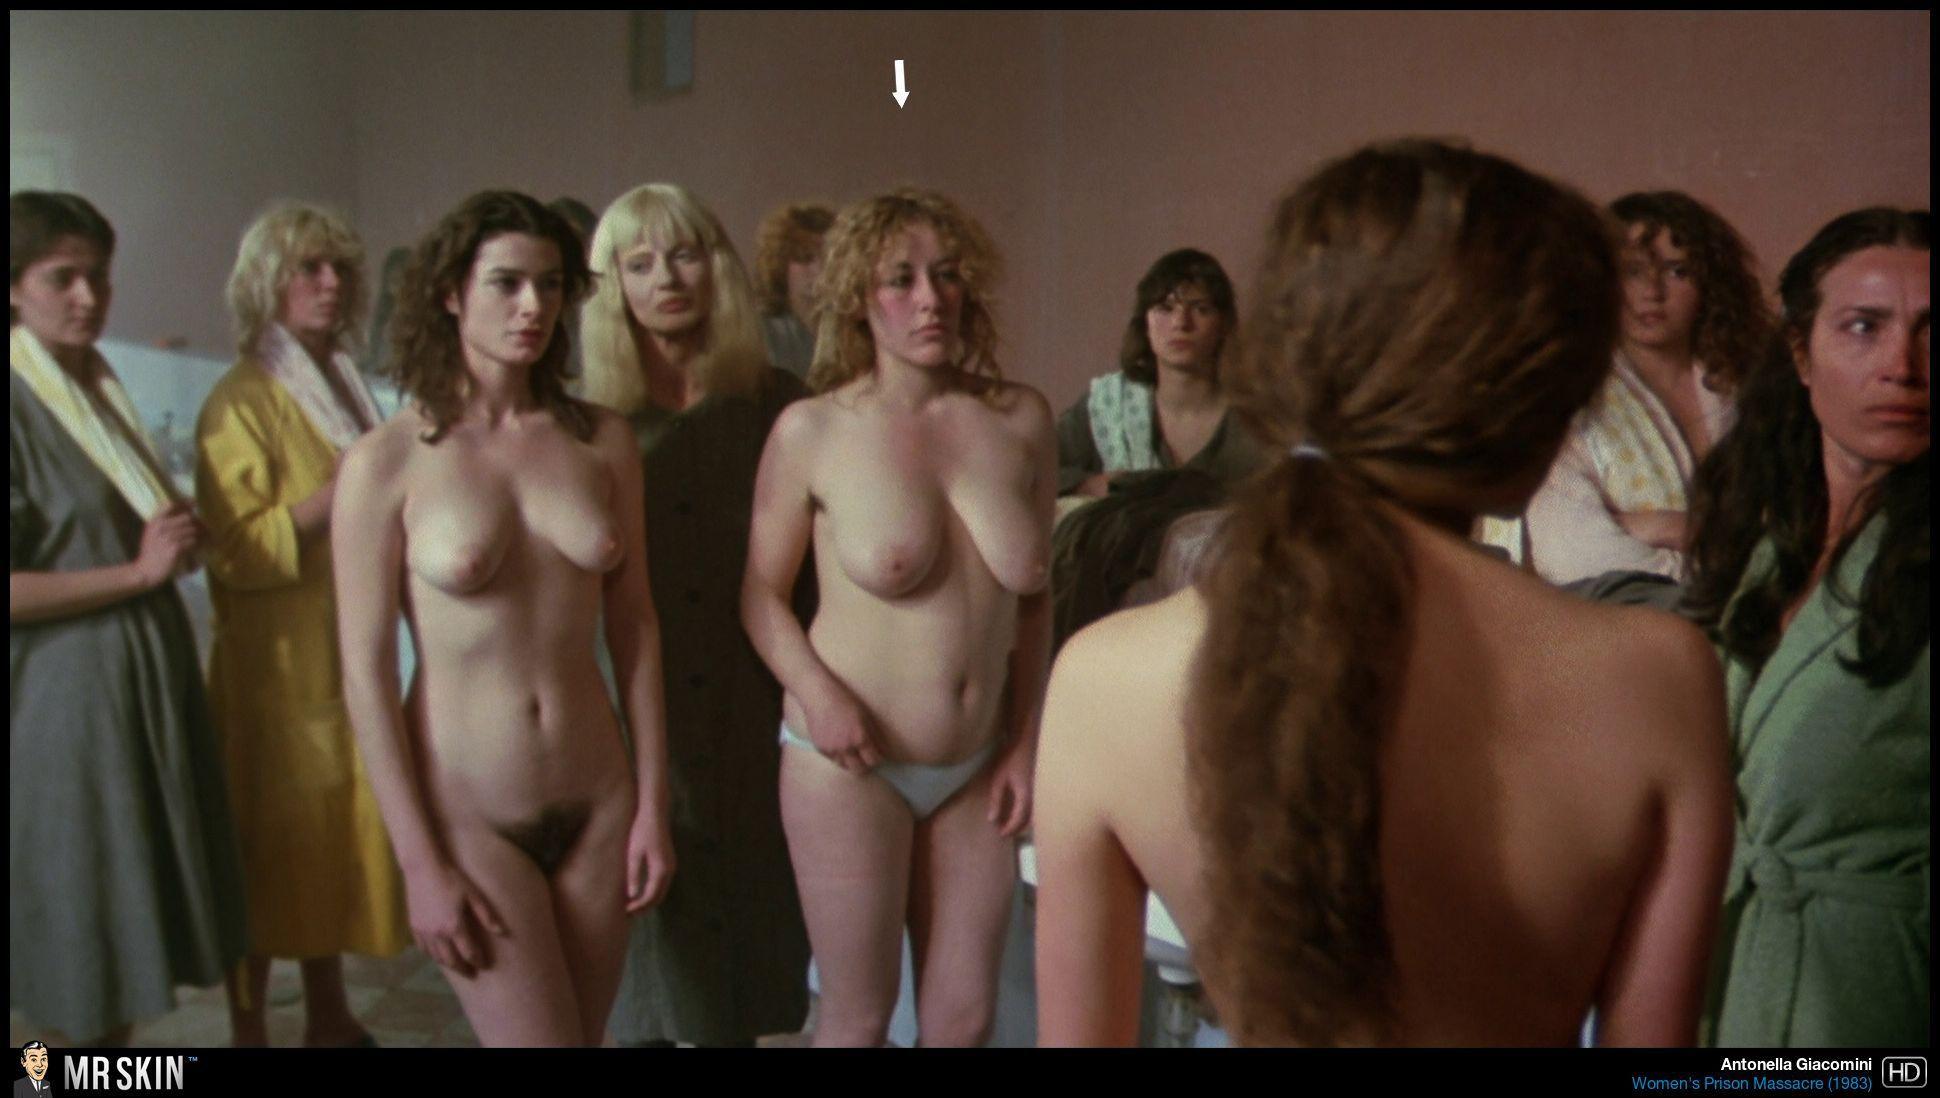 image Lorraine de selle nude scenes from madness